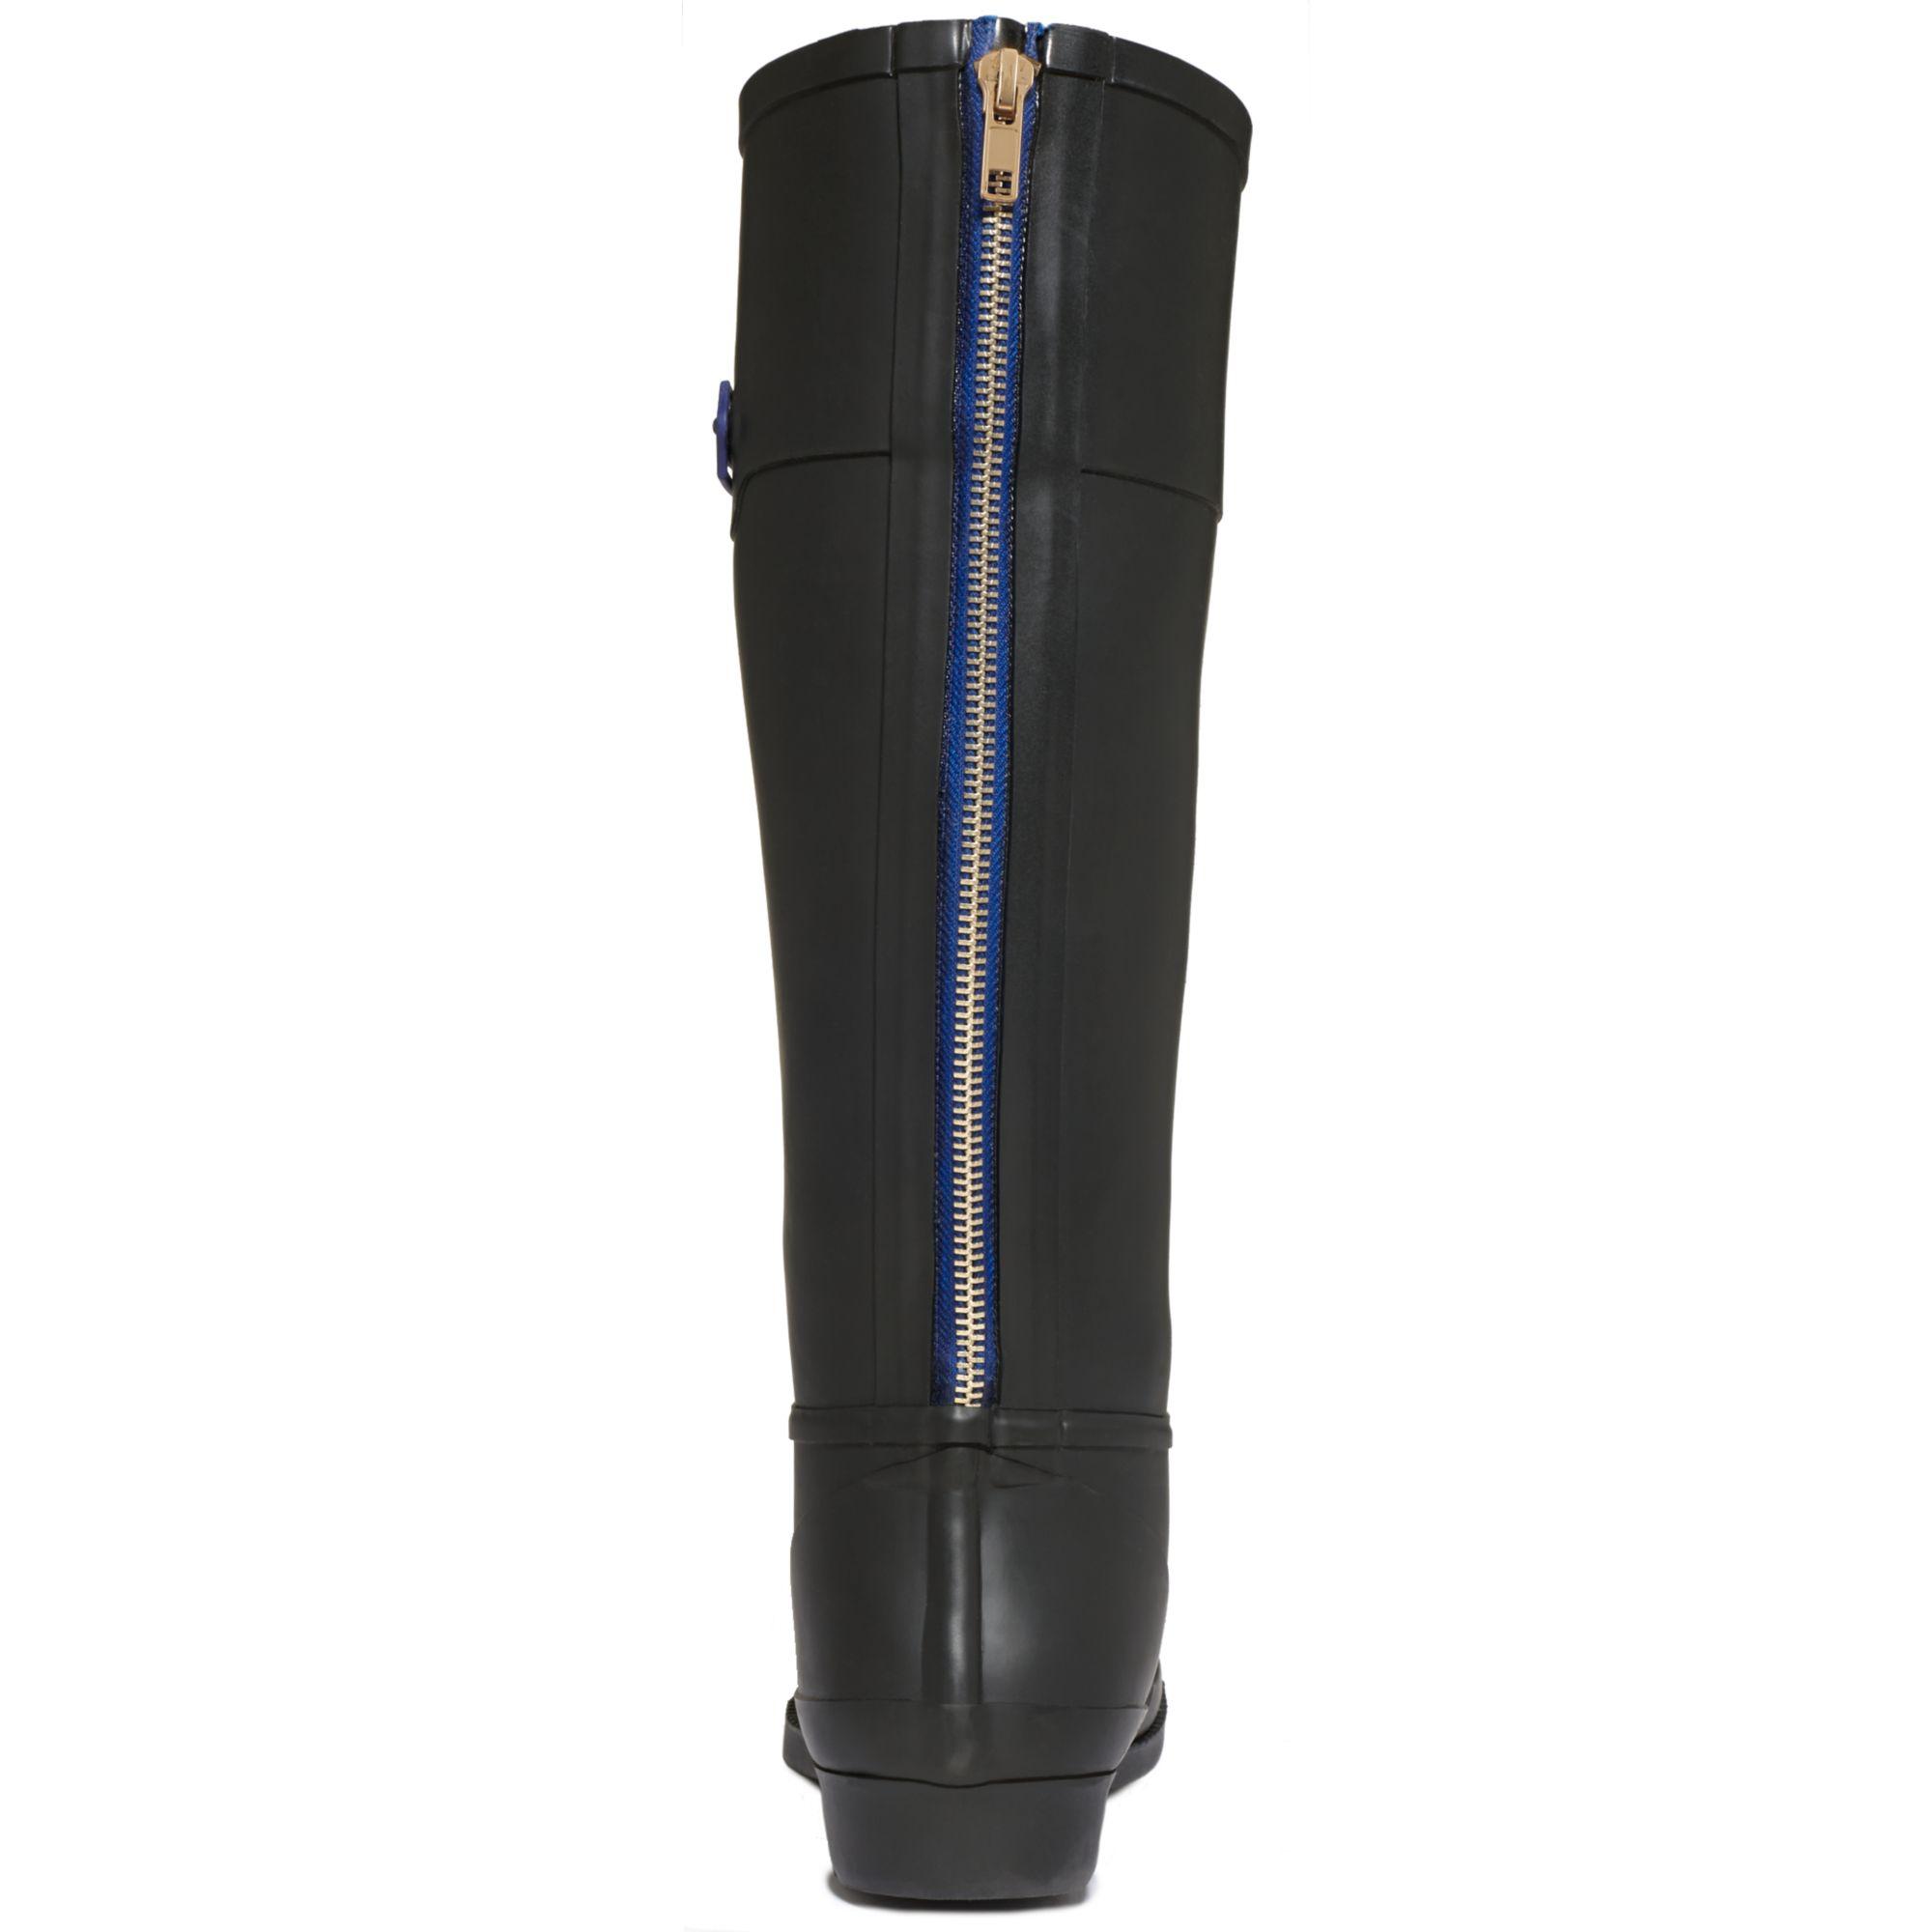 Tommy Hilfiger Coastal Rain Boots In Black - Lyst-6683